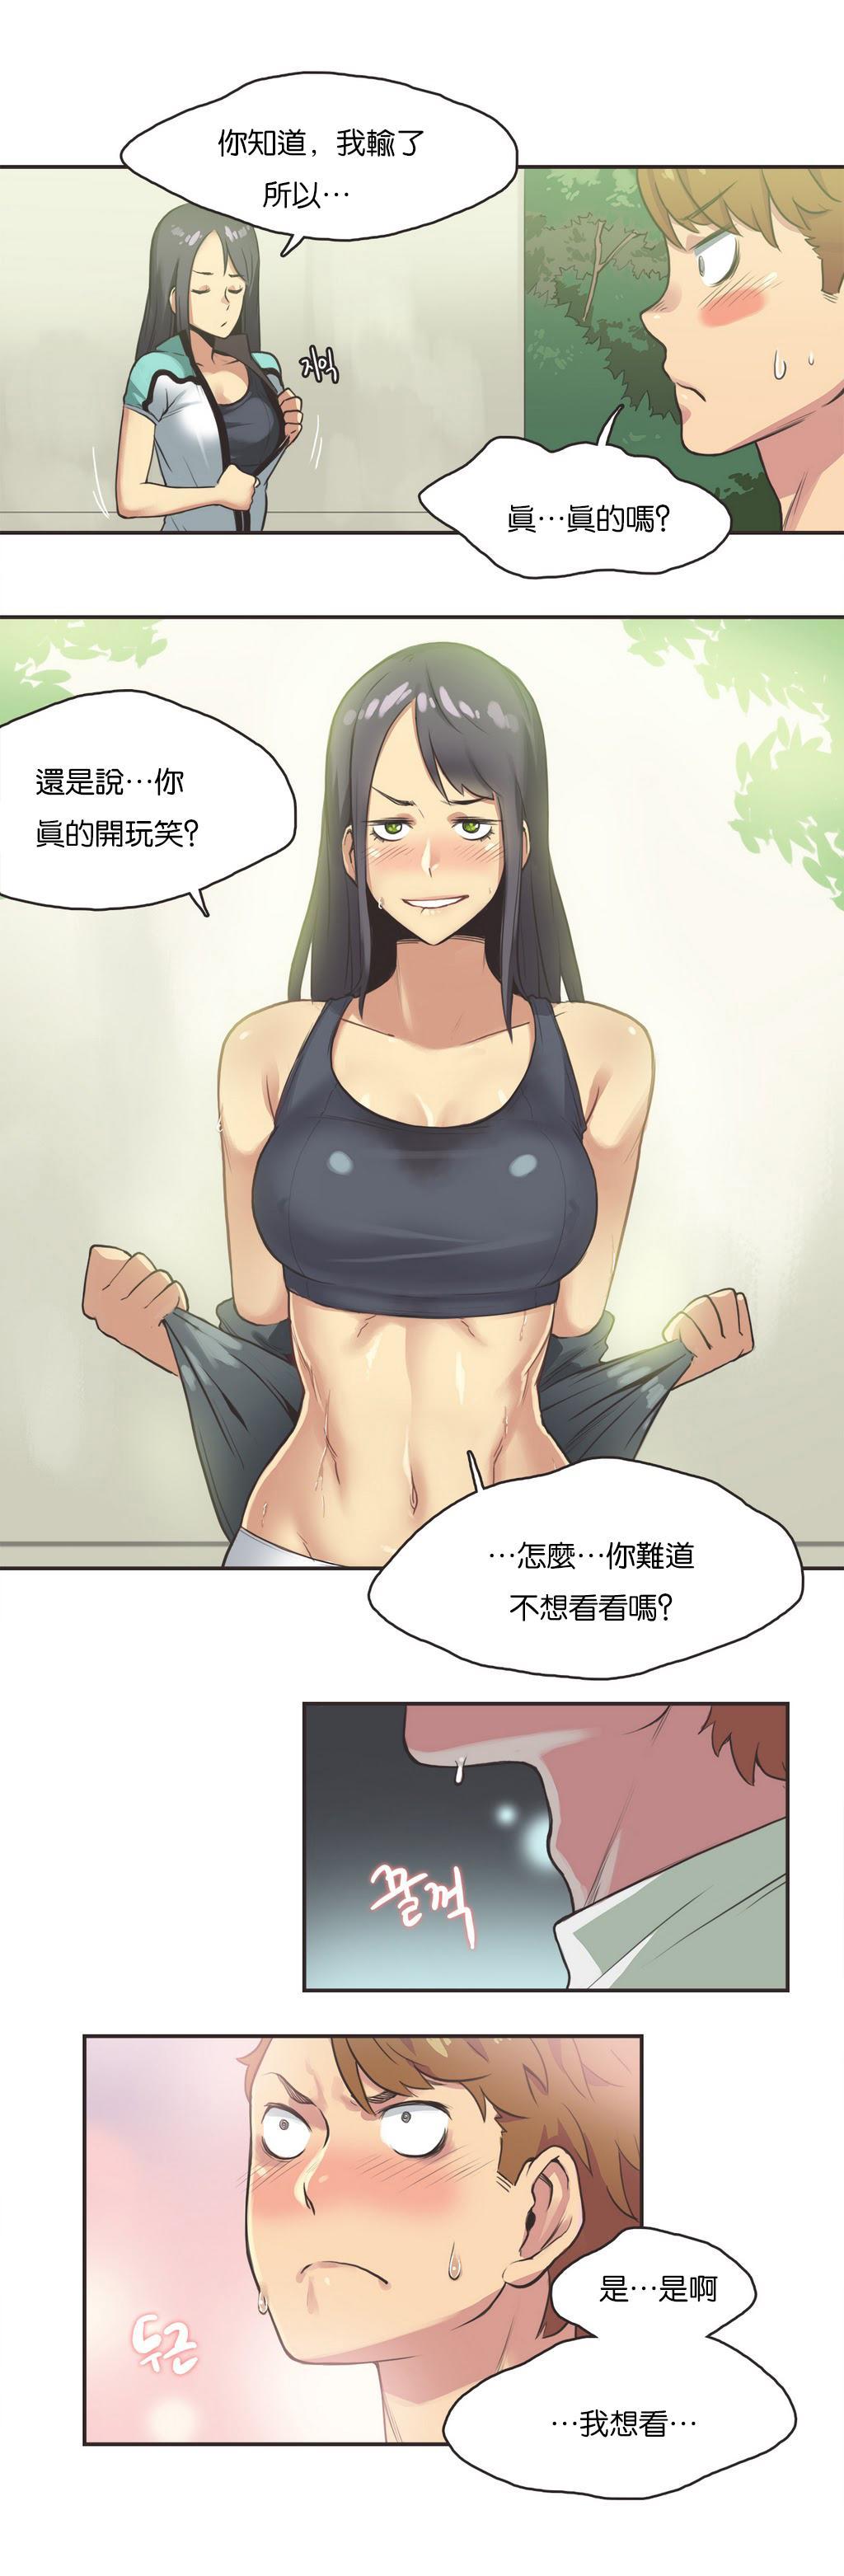 Sports Girl ch.1-11 187